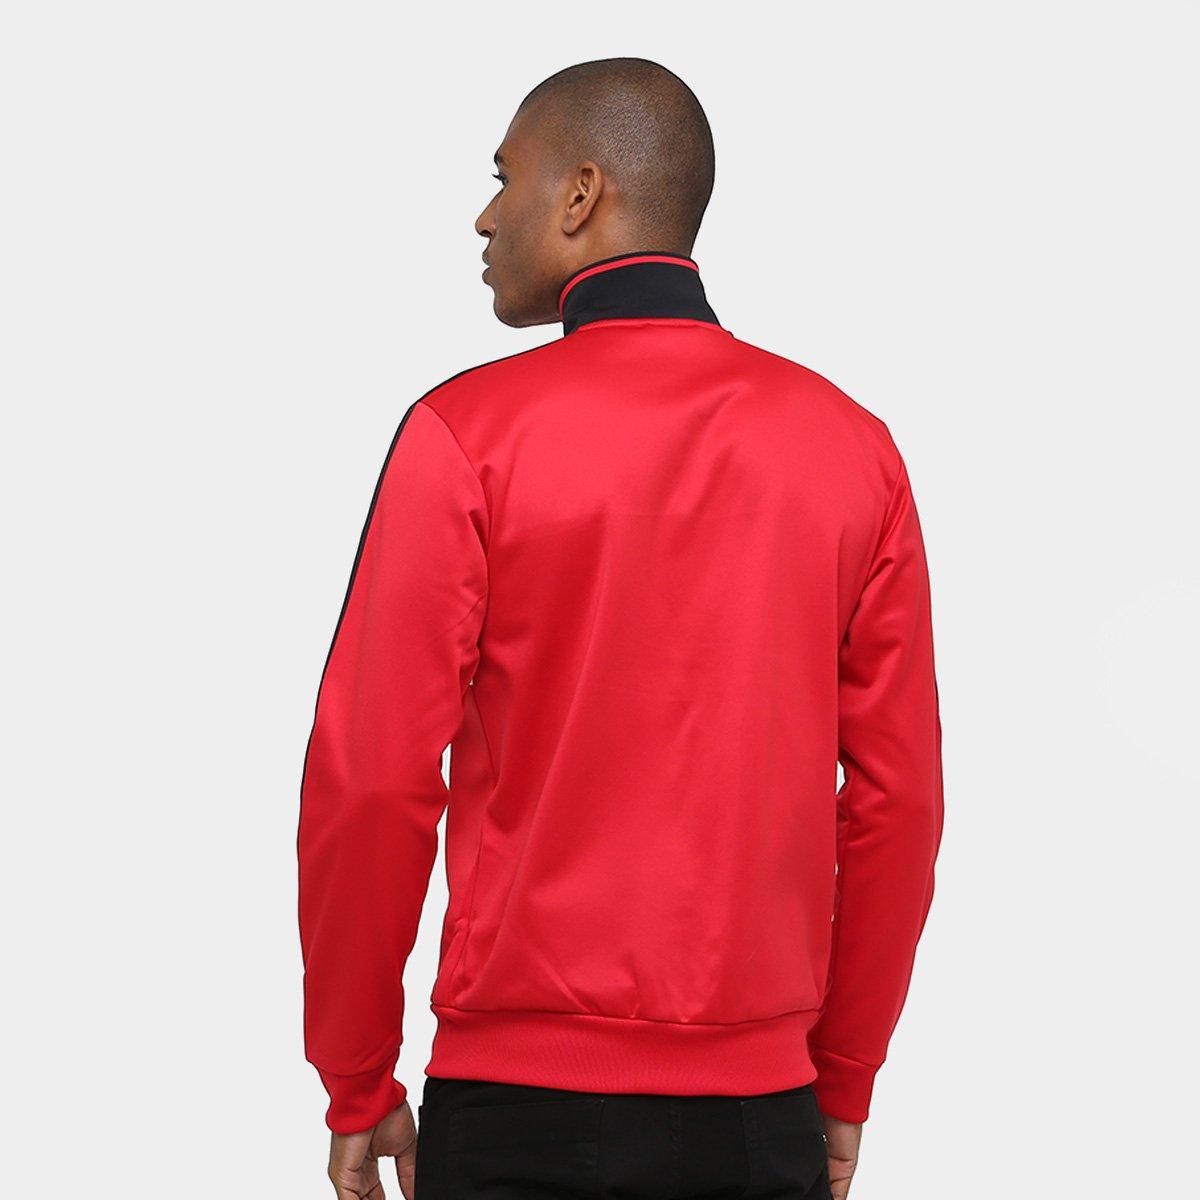 98b5f85f43 ... Jaqueta Manchester United Adidas 3S Masculina - Vermelho - Compre ...  b9558c321862b7  Centauro. Jaqueta Manchester United 18 19 ...